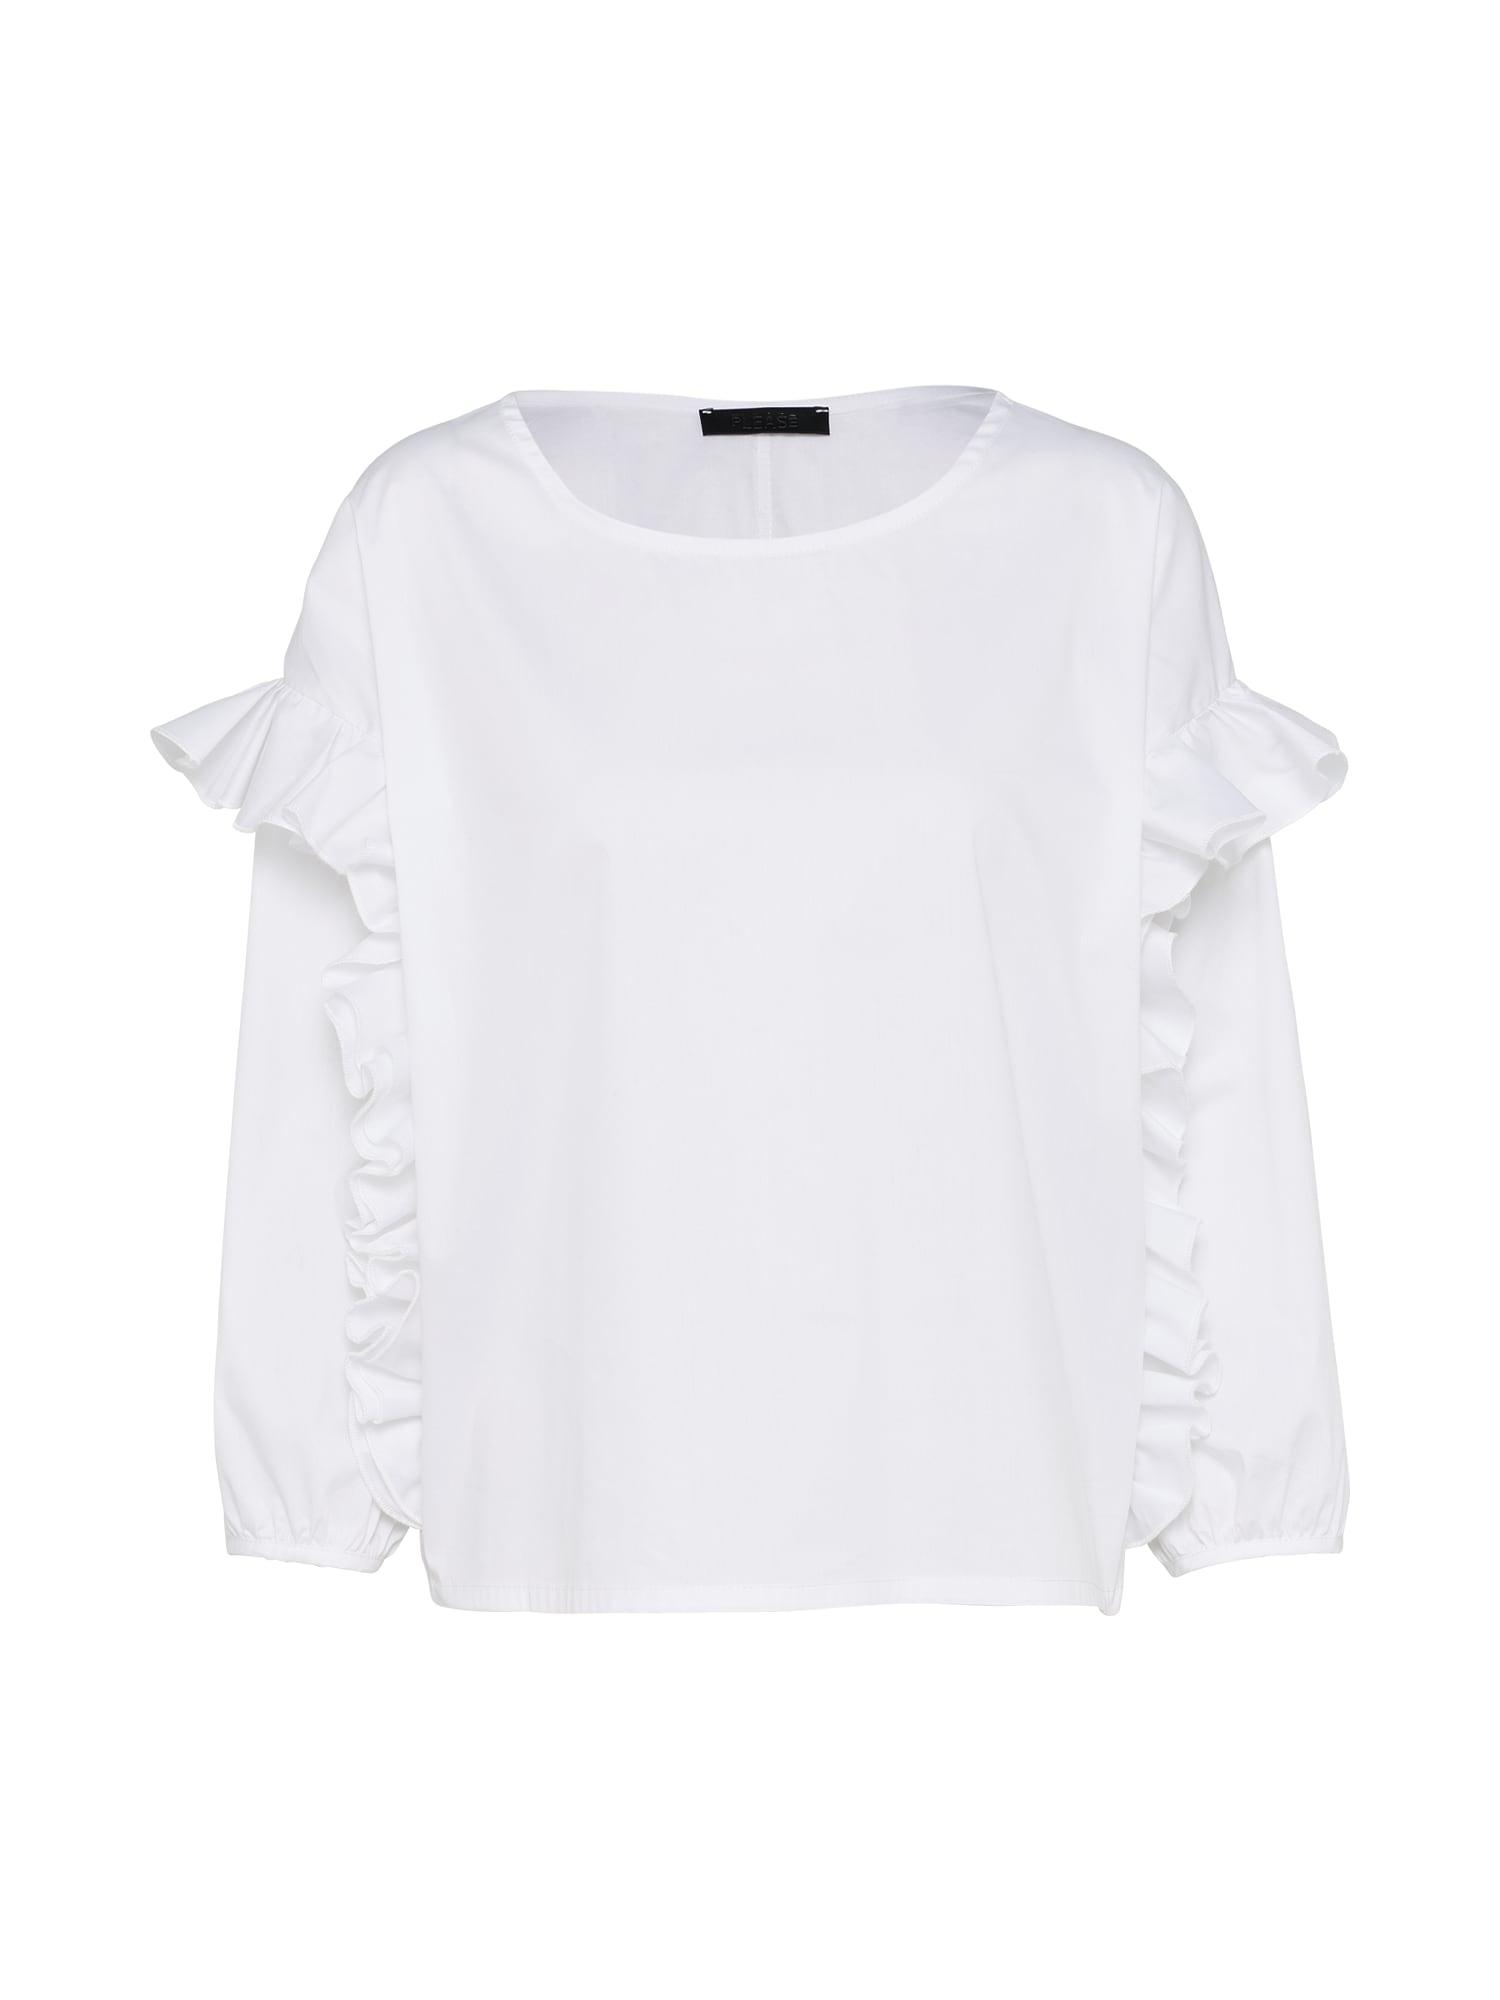 Tričko shirt offwhite PLEASE